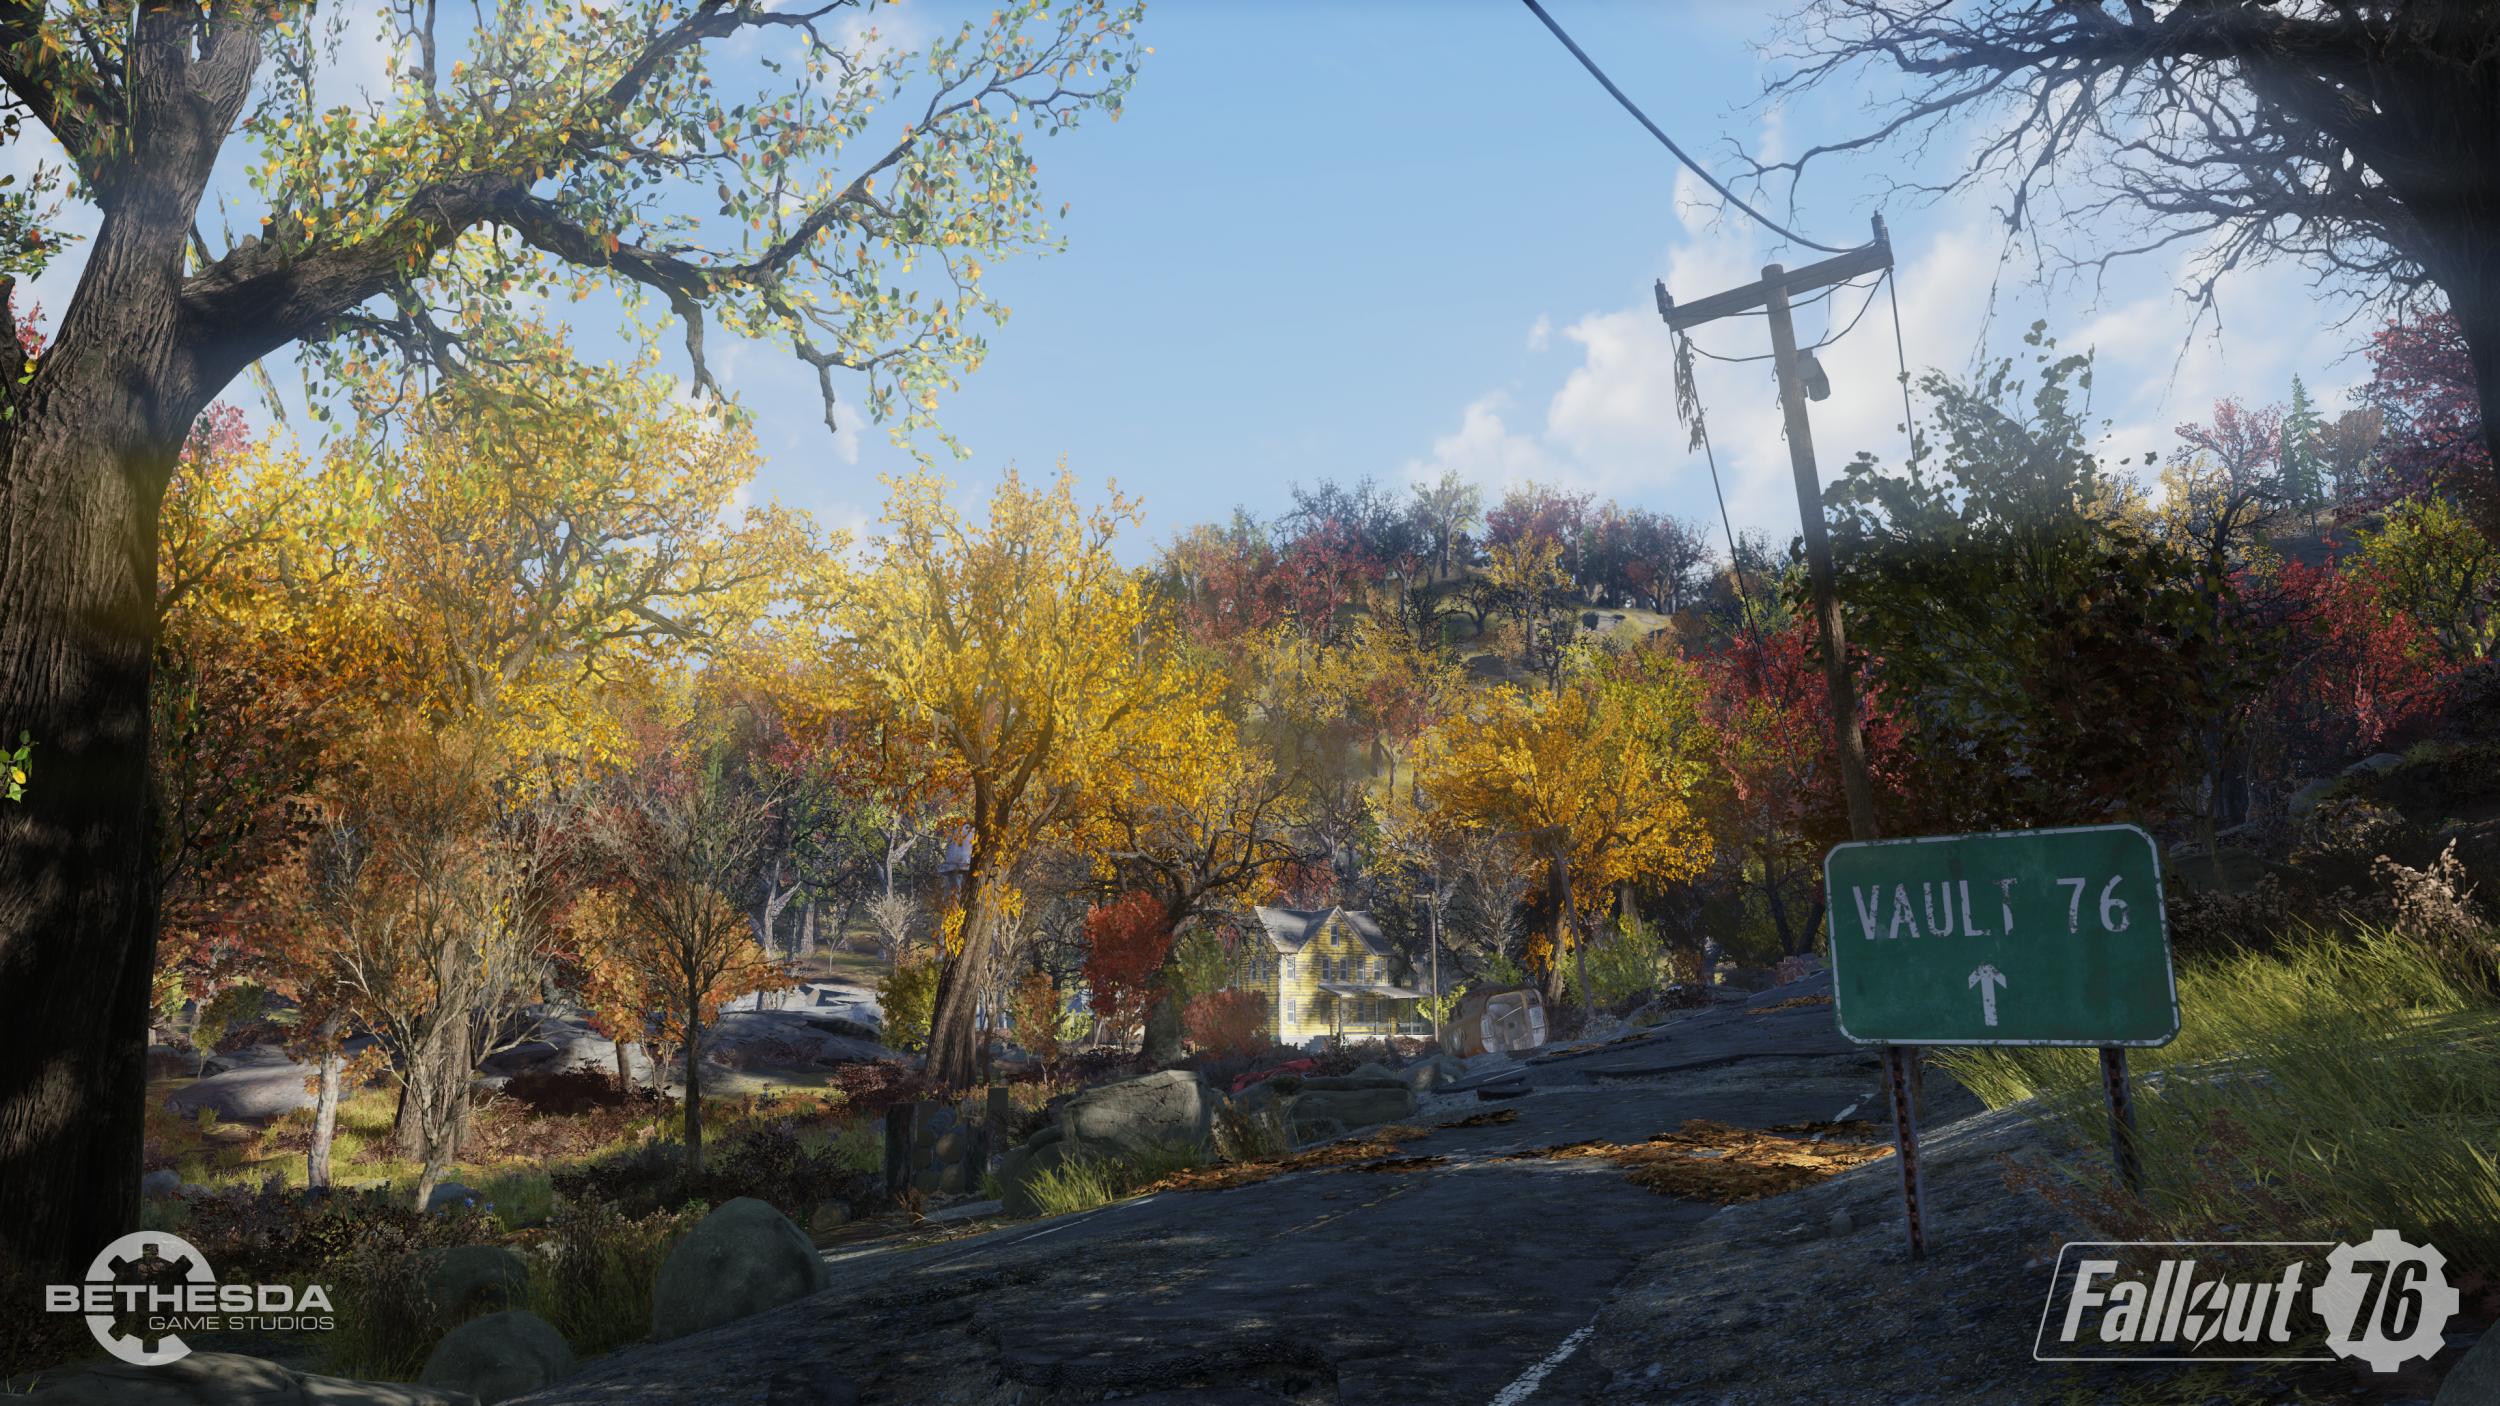 Fallout 4 vault 76 base building guide